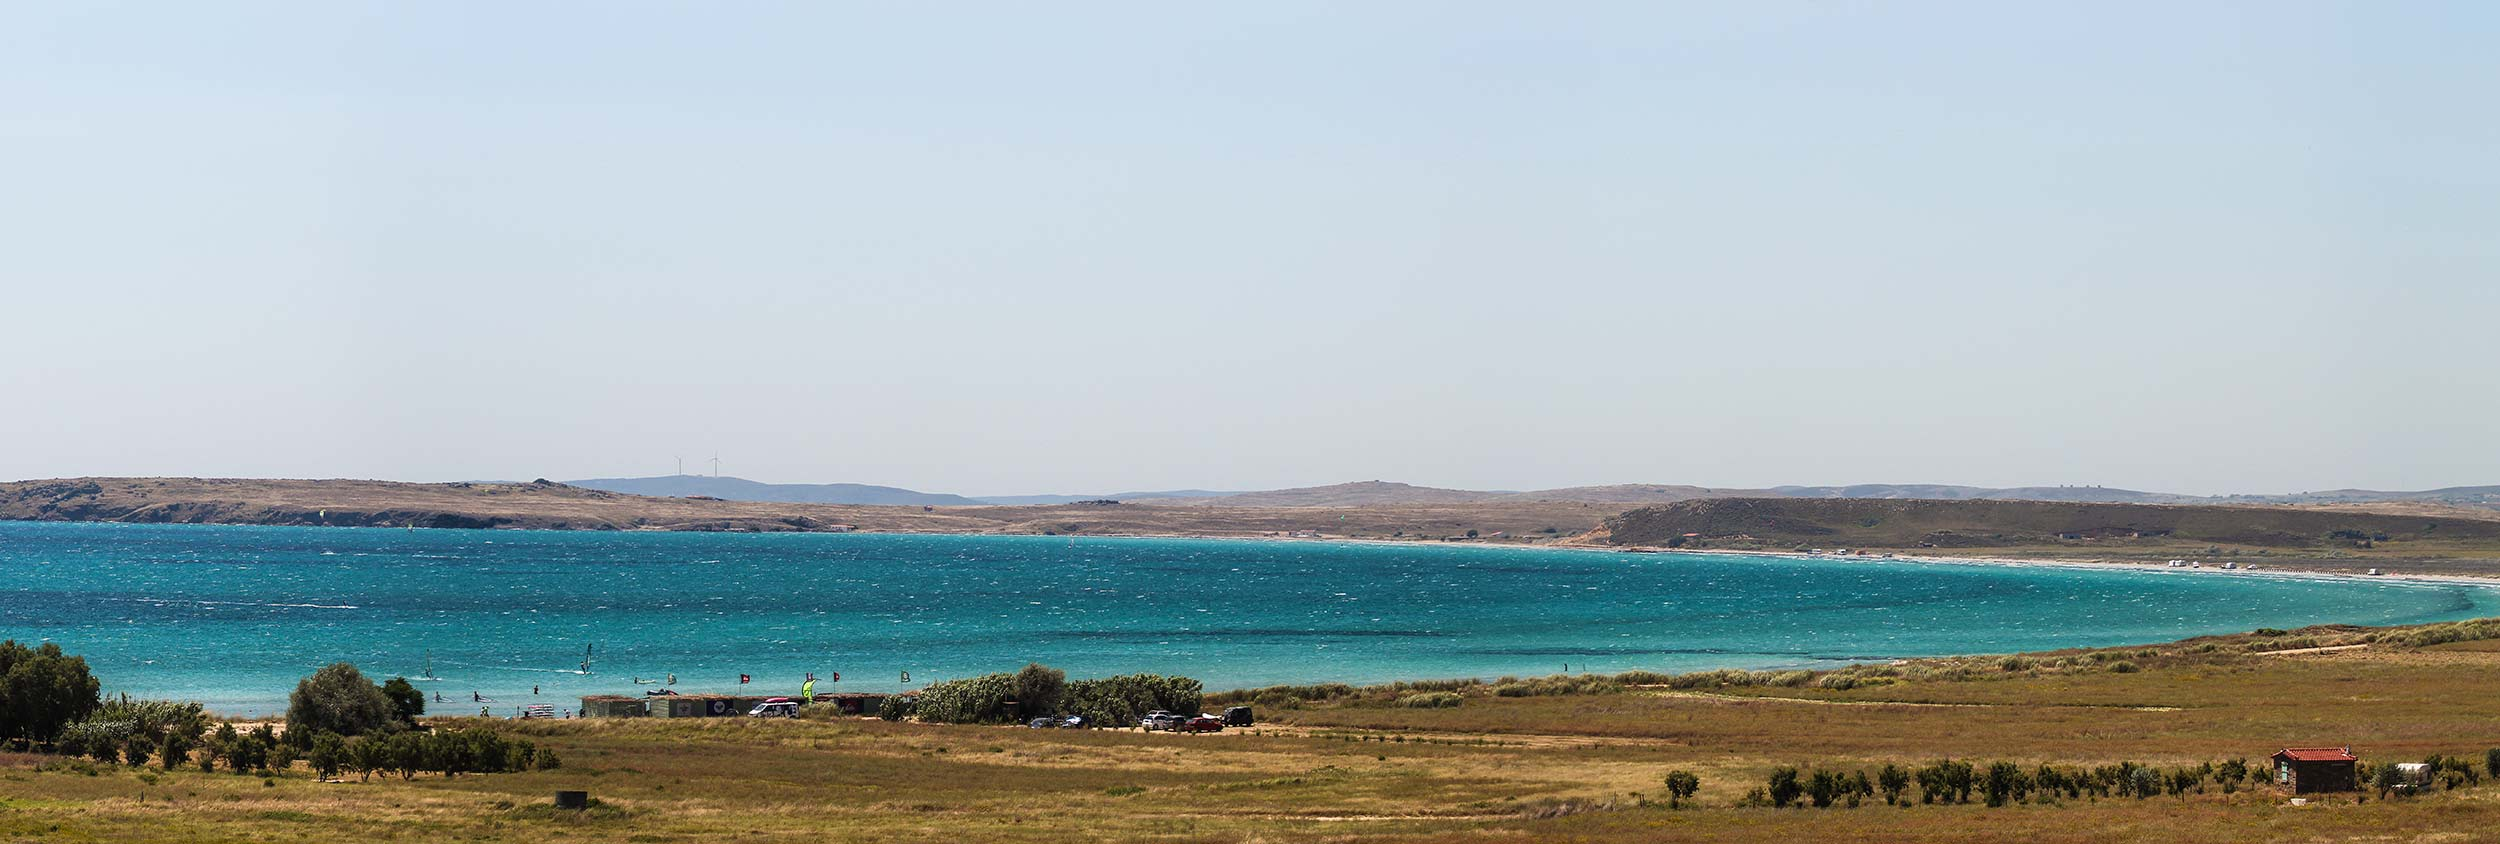 limnos-greece kitespot